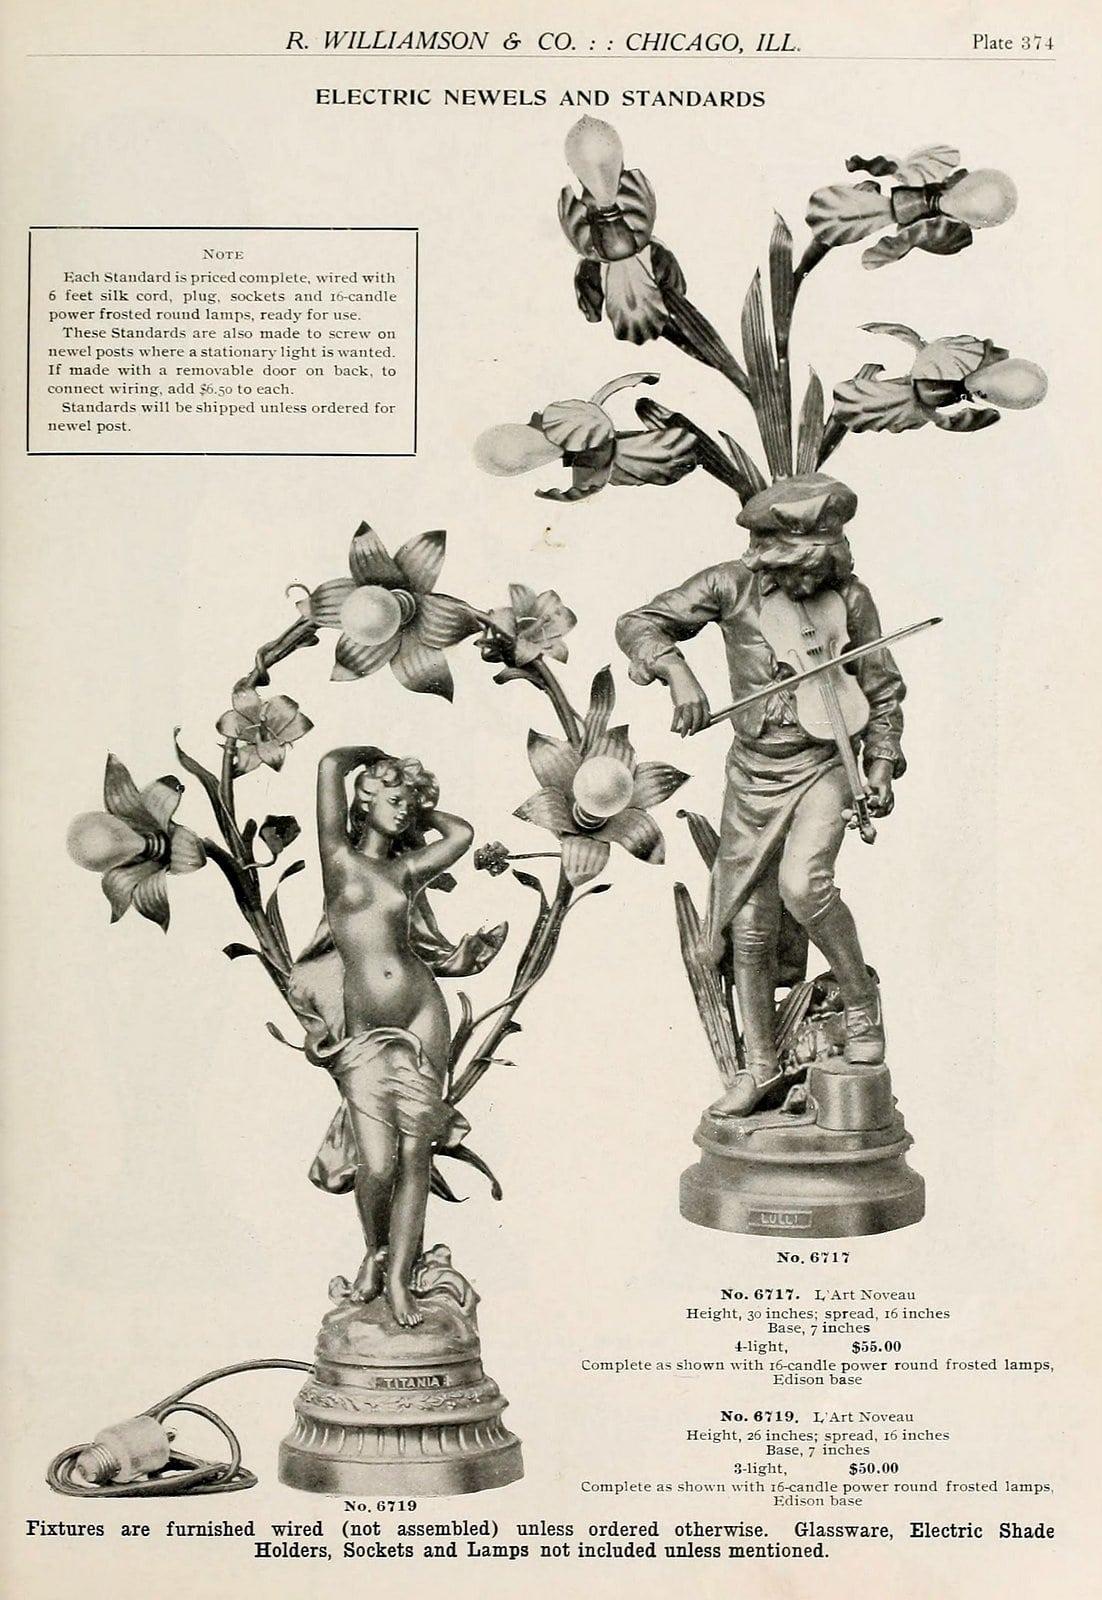 Antique lamp designs from around 1910 (1)